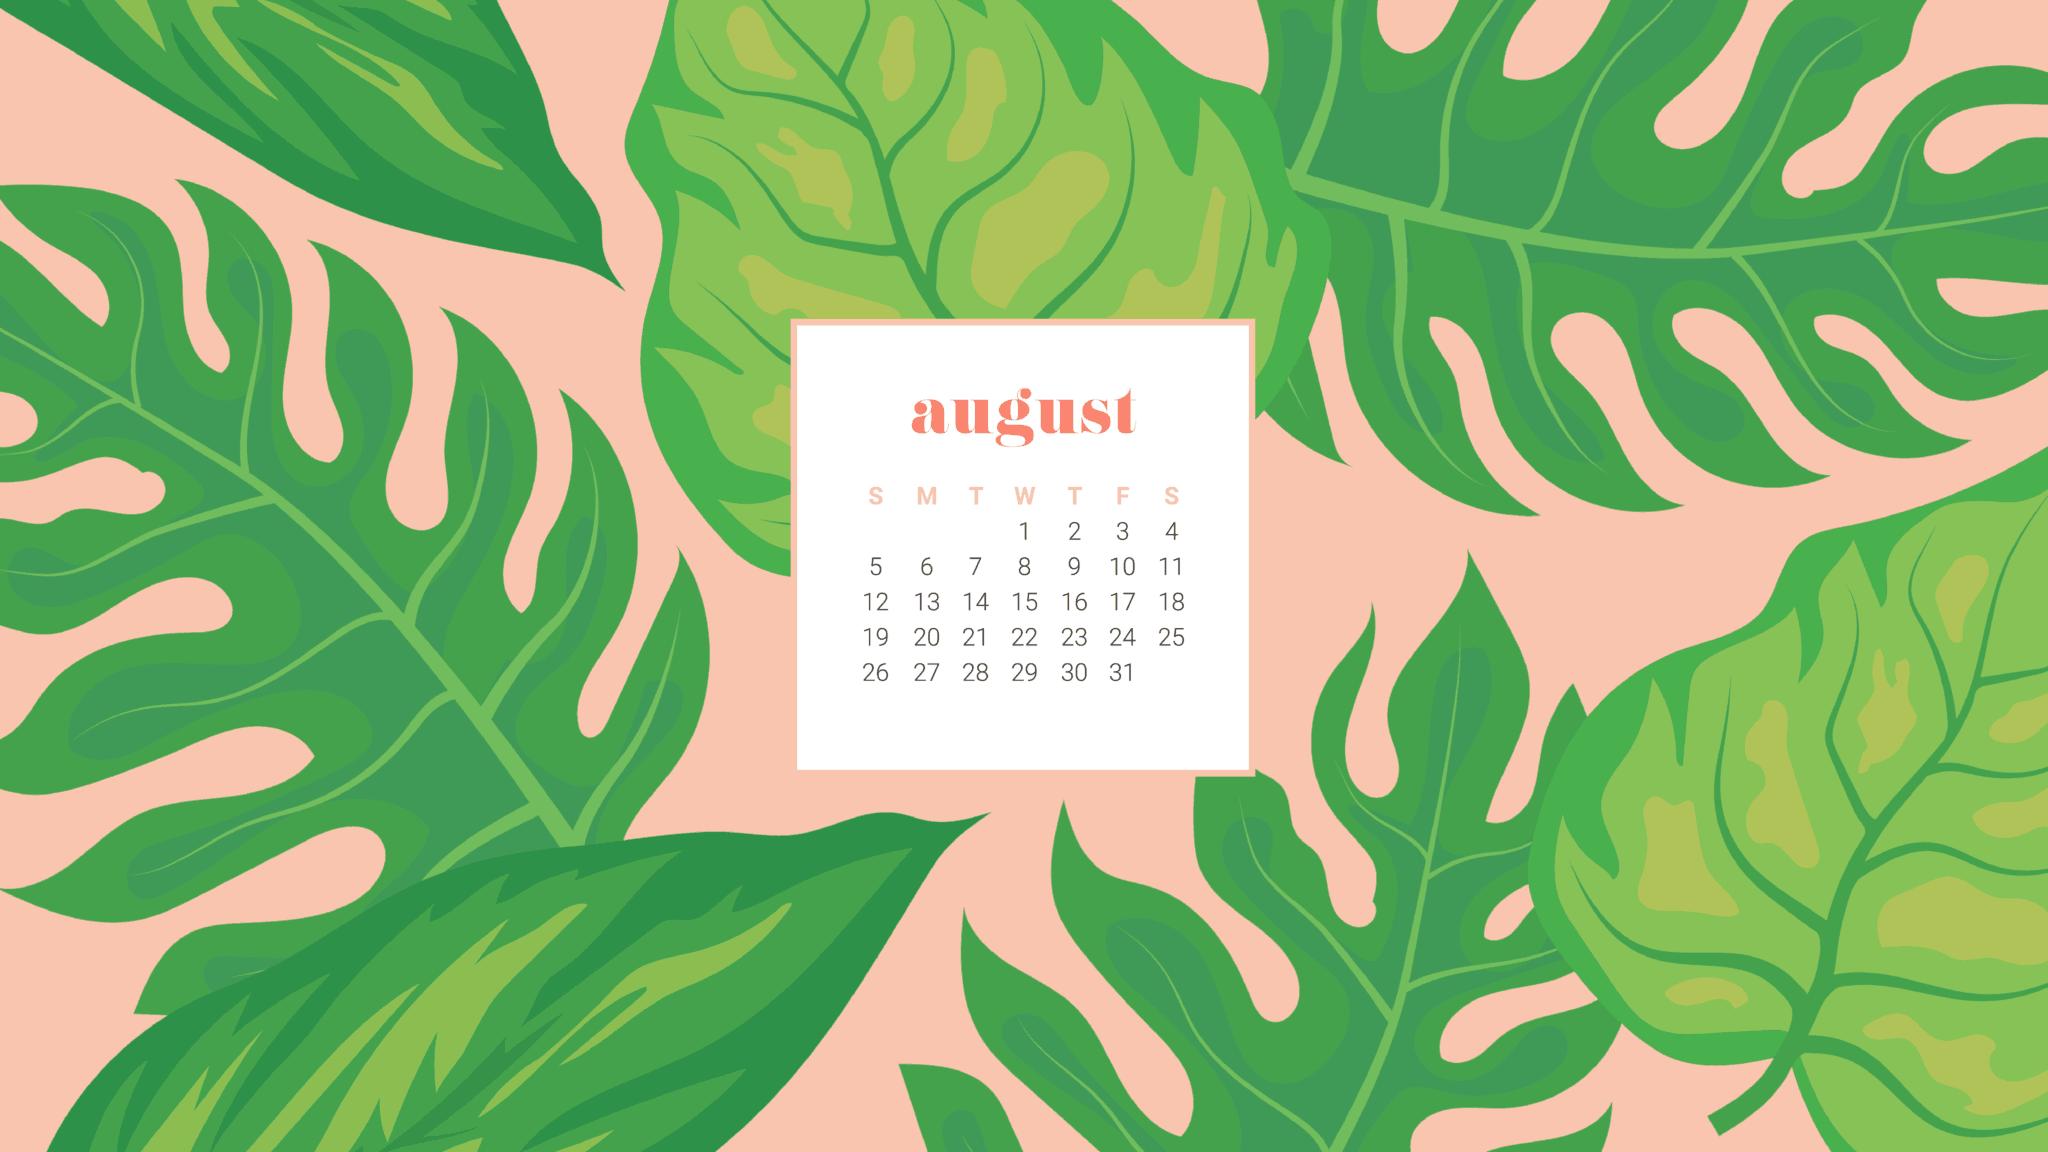 Free August Desktop Calendar Wallpapers Download Yours Today